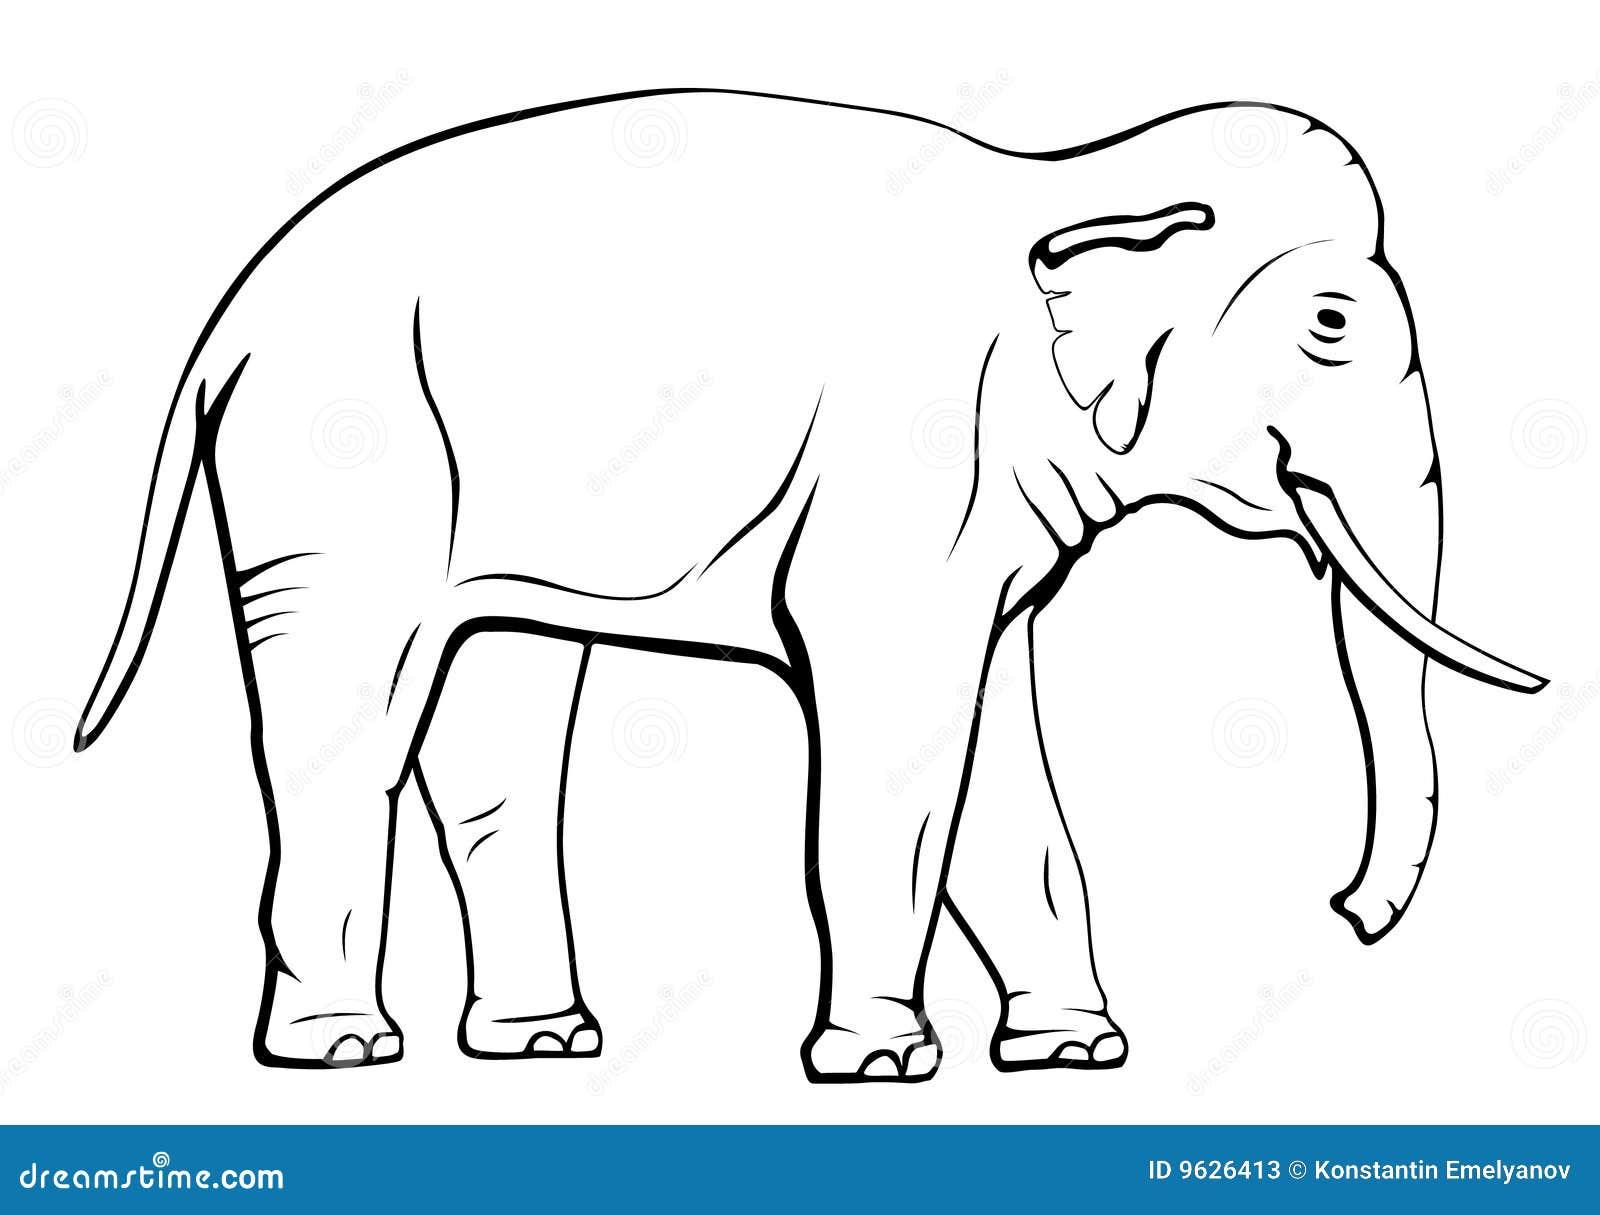 Elephant stock vector. Illustration of elephant ...